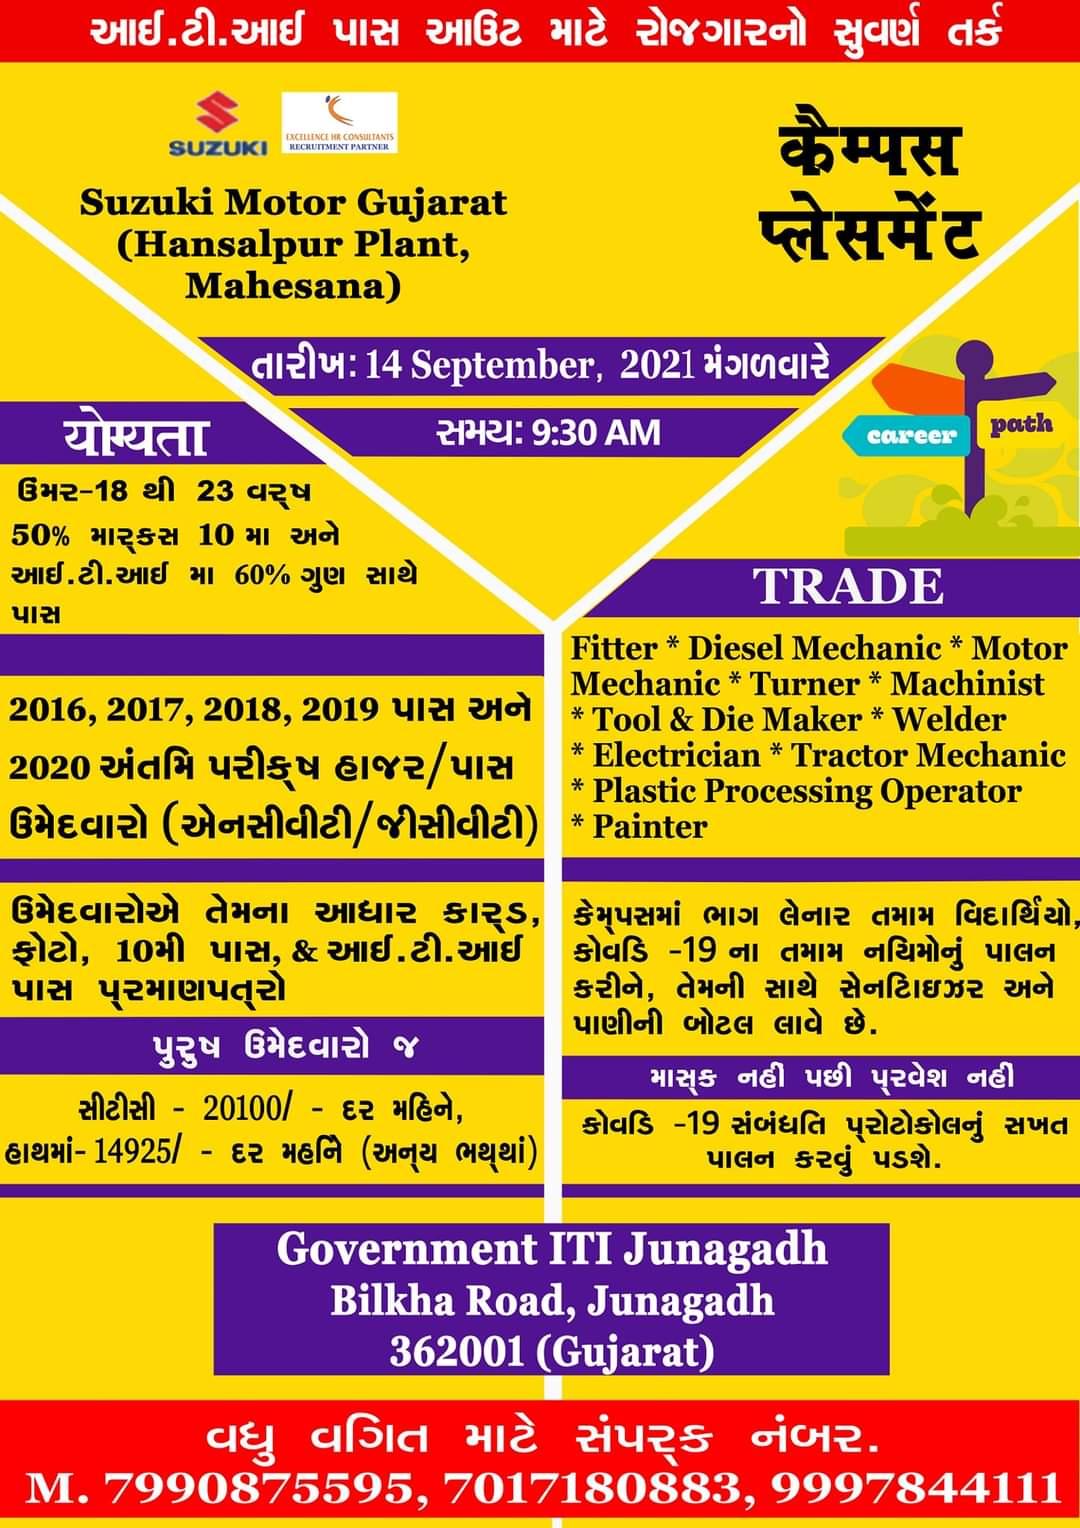 ITI Campus Recruitment On 13th & 14th September 2021 at Govt ITI Veraval, Somnath and Govt ITI Junagadh, Gujarat For Suzuki Motors